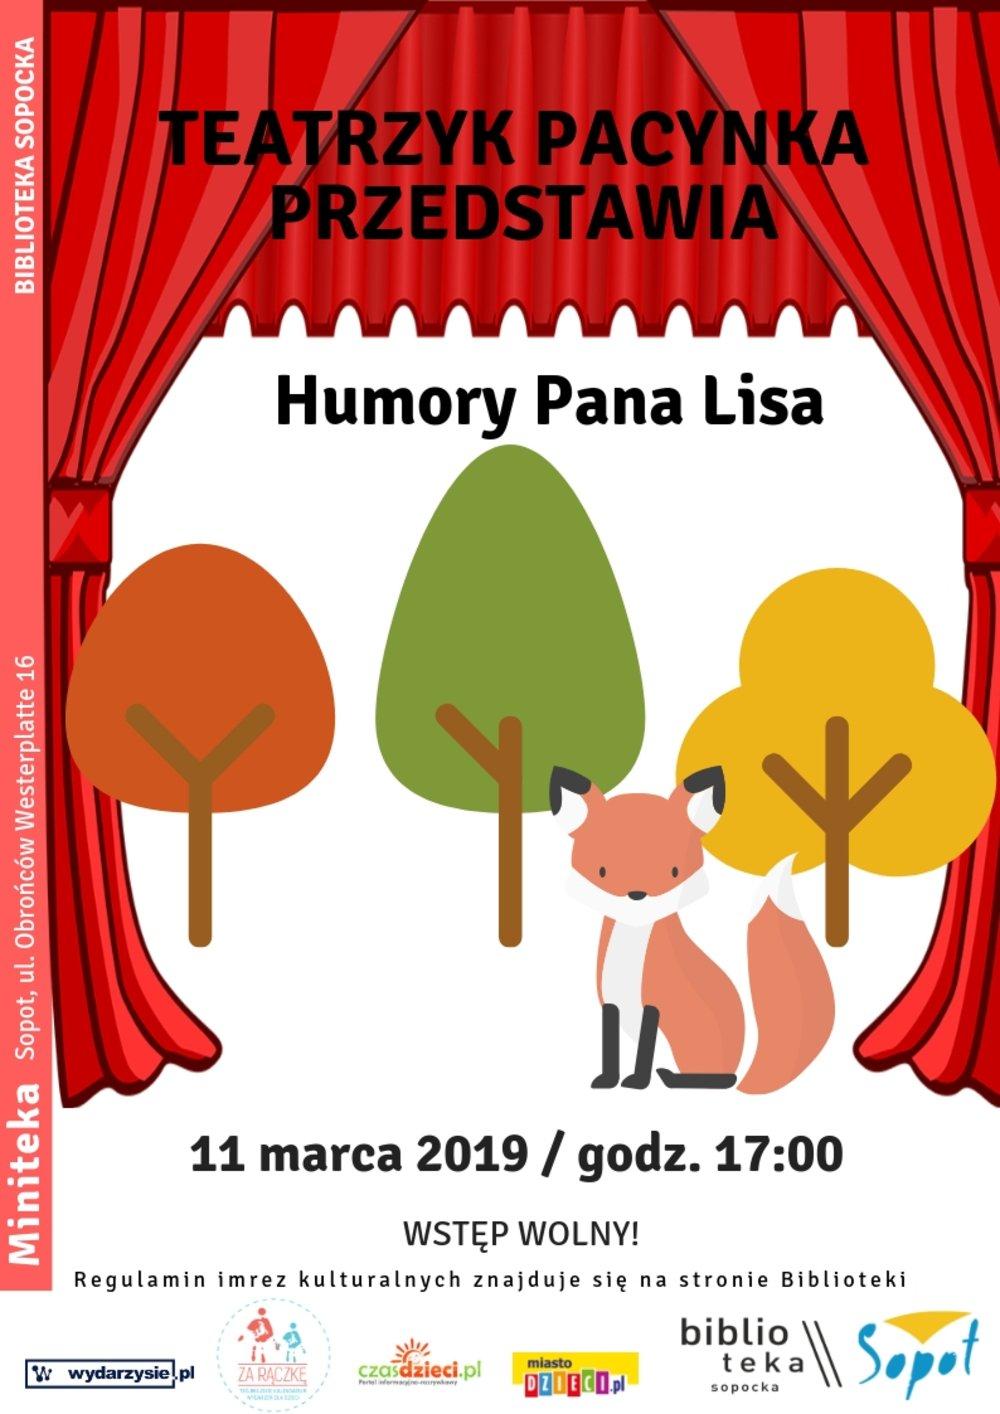 Teatrzyk Pacynka: Humory Pana Lisa